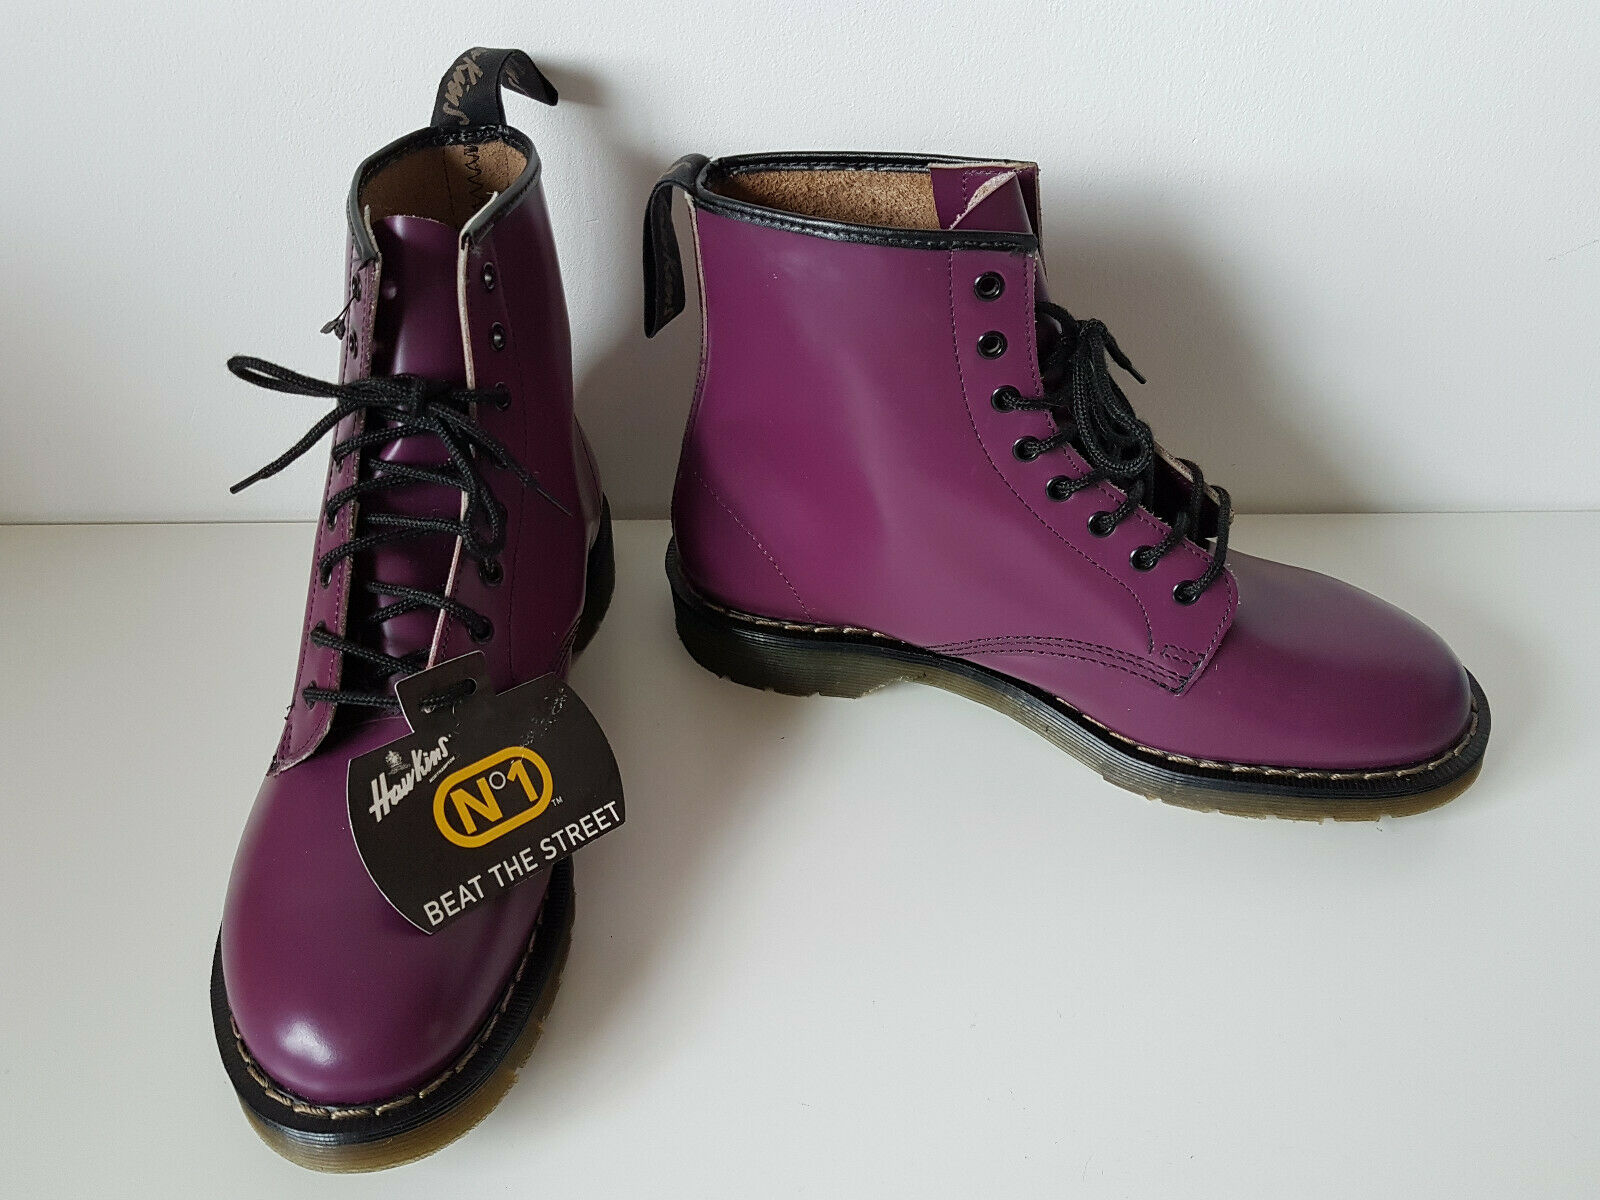 venta al por mayor barato Nuevo Nuevo Nuevo e 42 US 10 Hawkins (Dr Martens) botas púrpura 1460 Raro Retro Inglaterra  autentico en linea